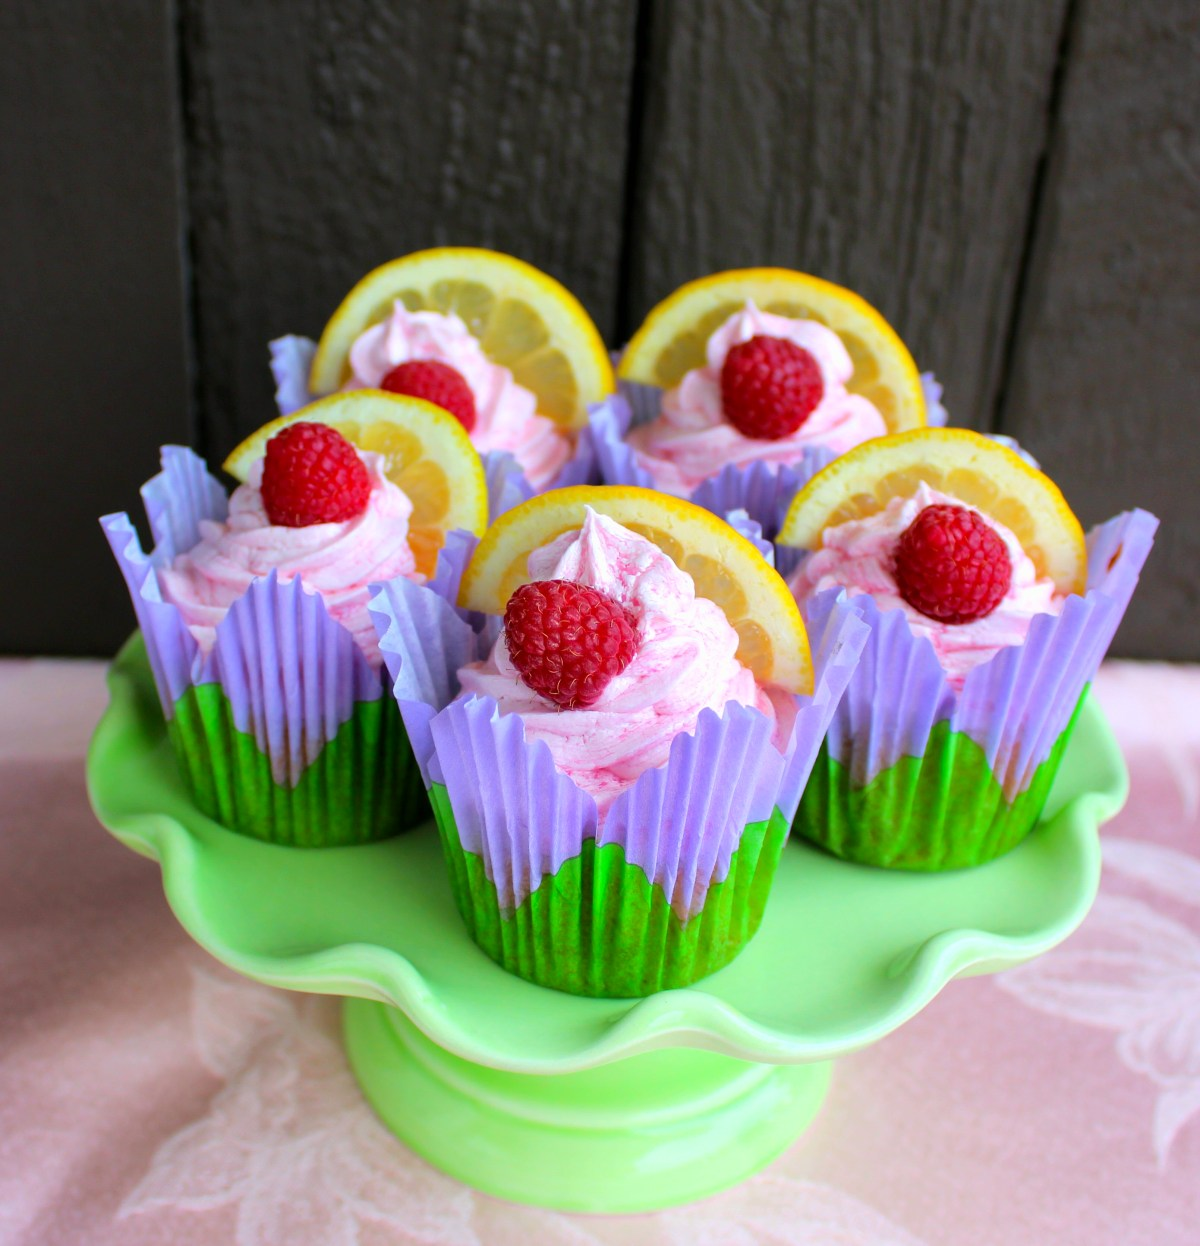 Pink Lemonade Cupcakes (Dairy-free)